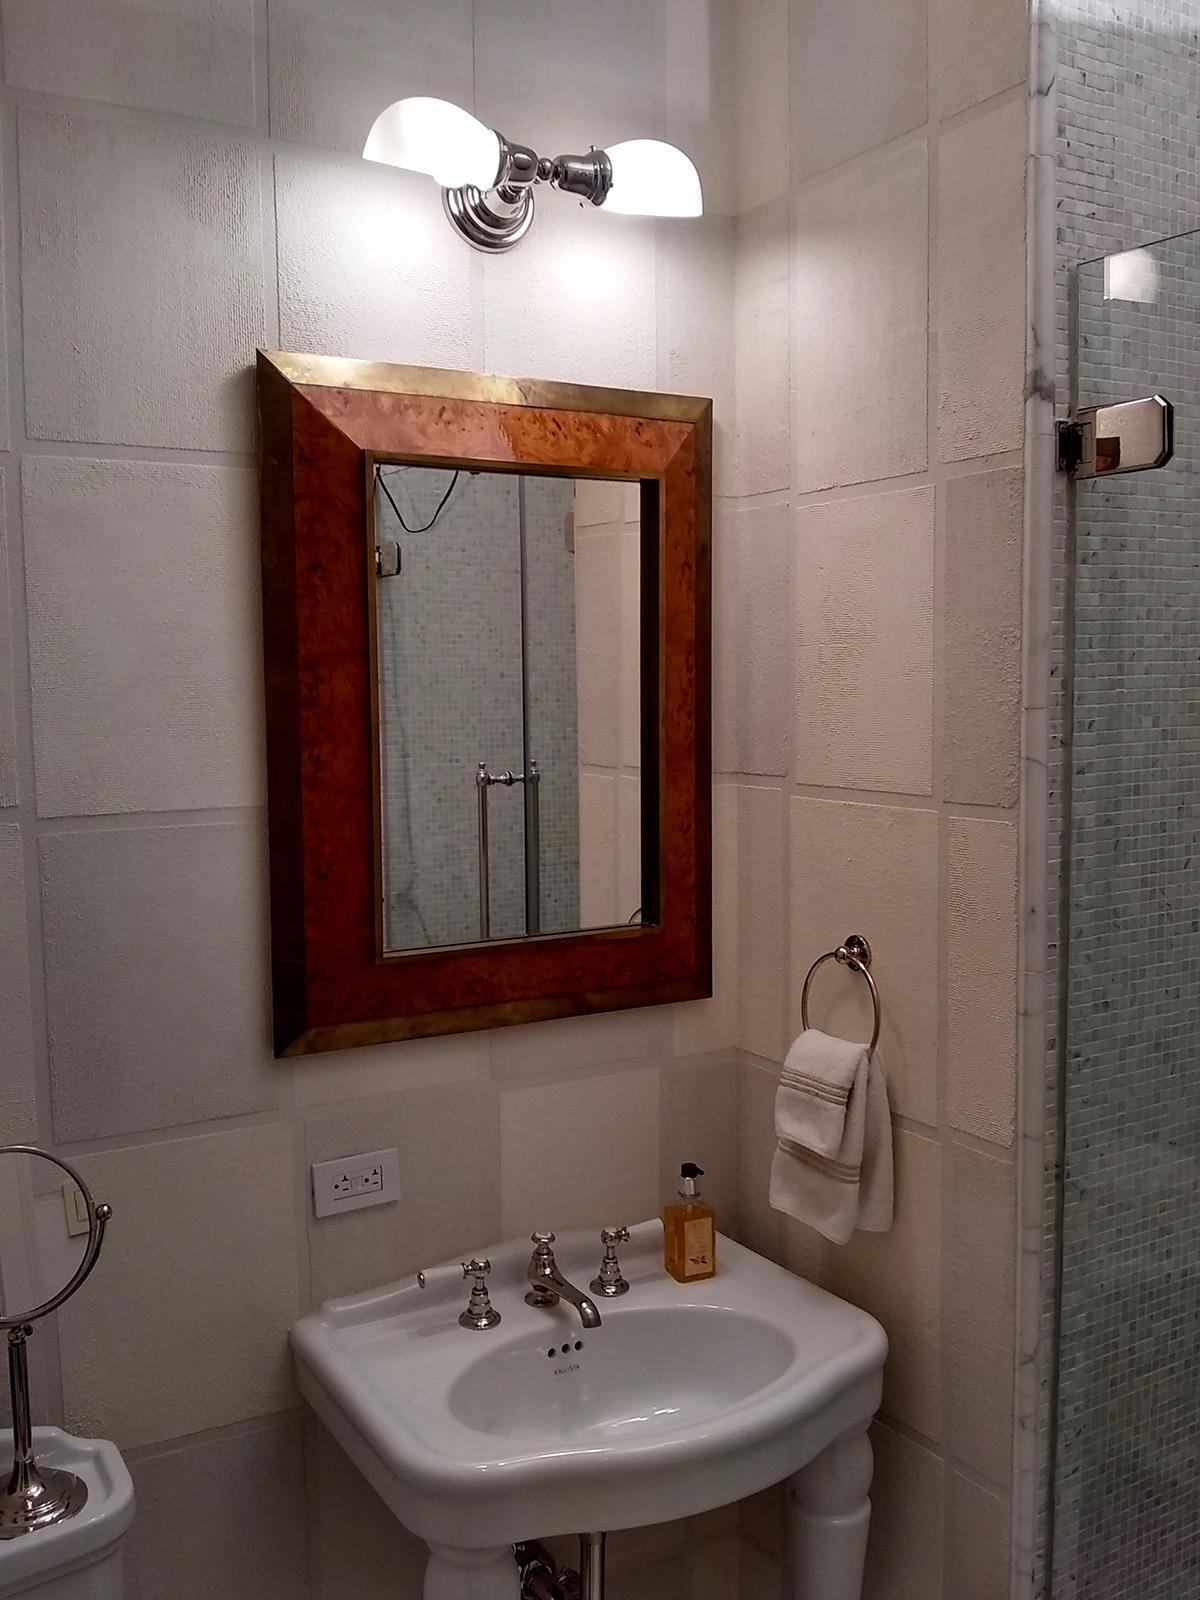 Plaza Fairmont, Bathroom